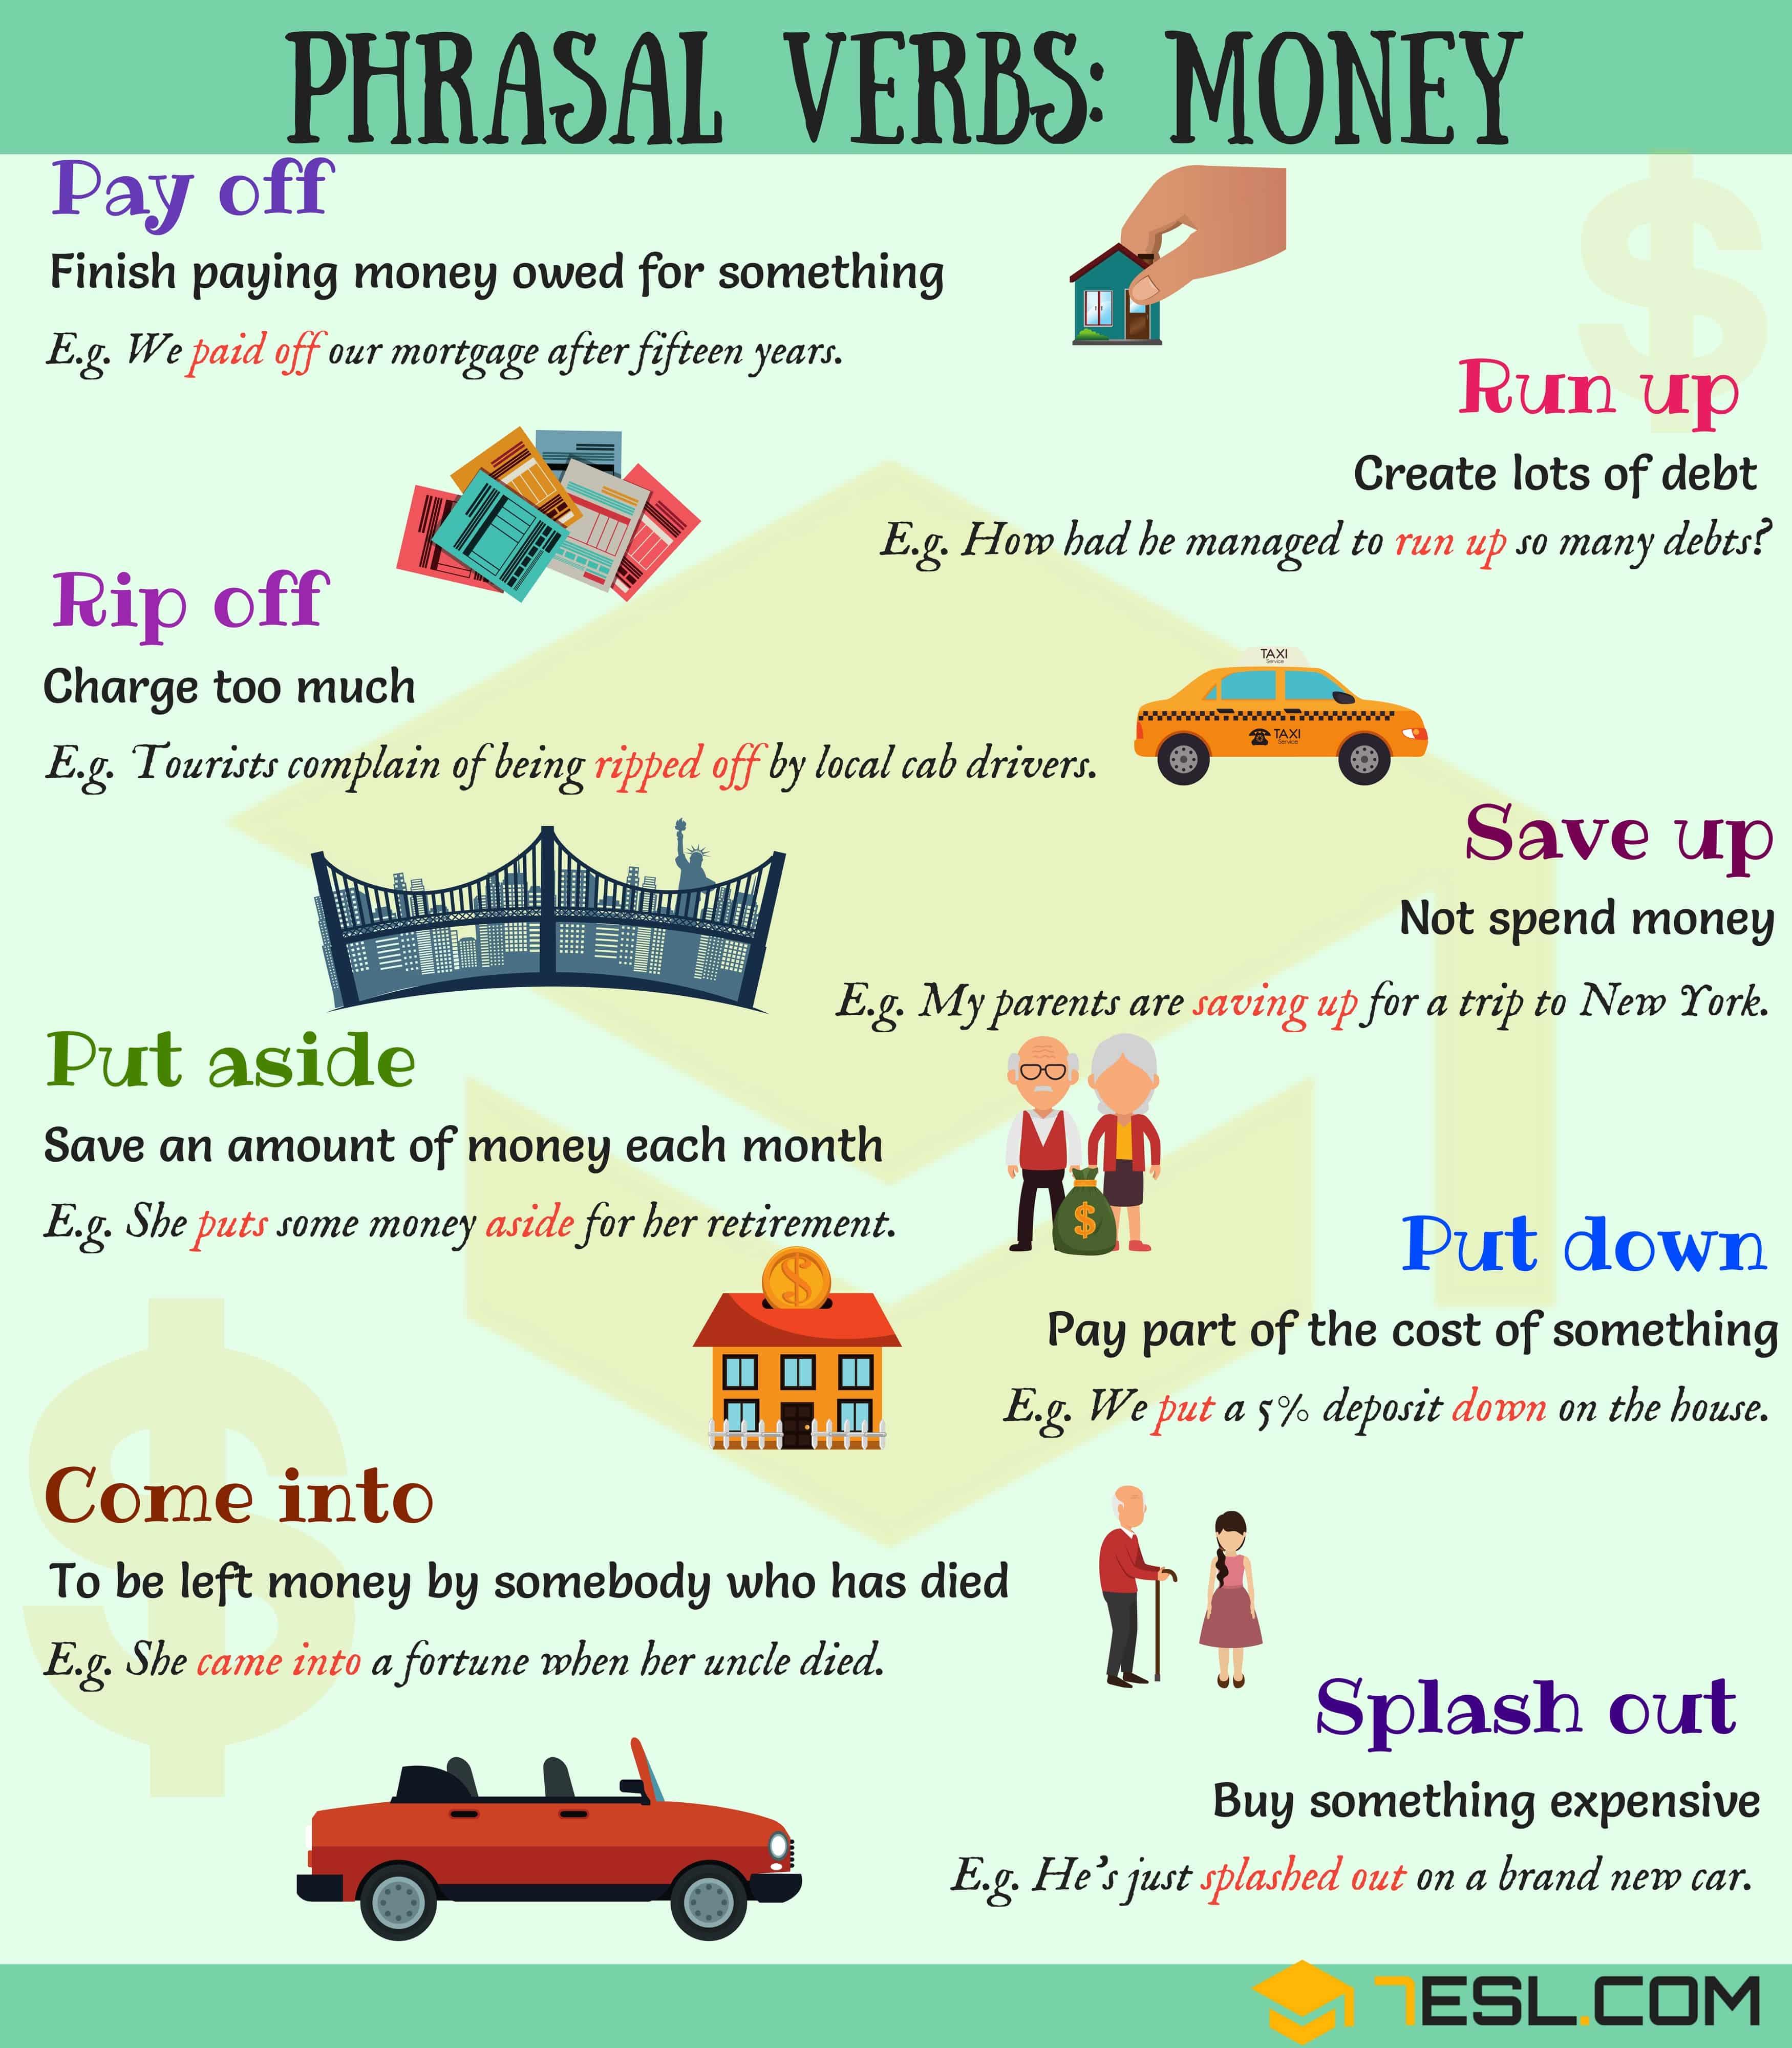 Money Vocabulary 11 Common Phrasal Verbs About Money